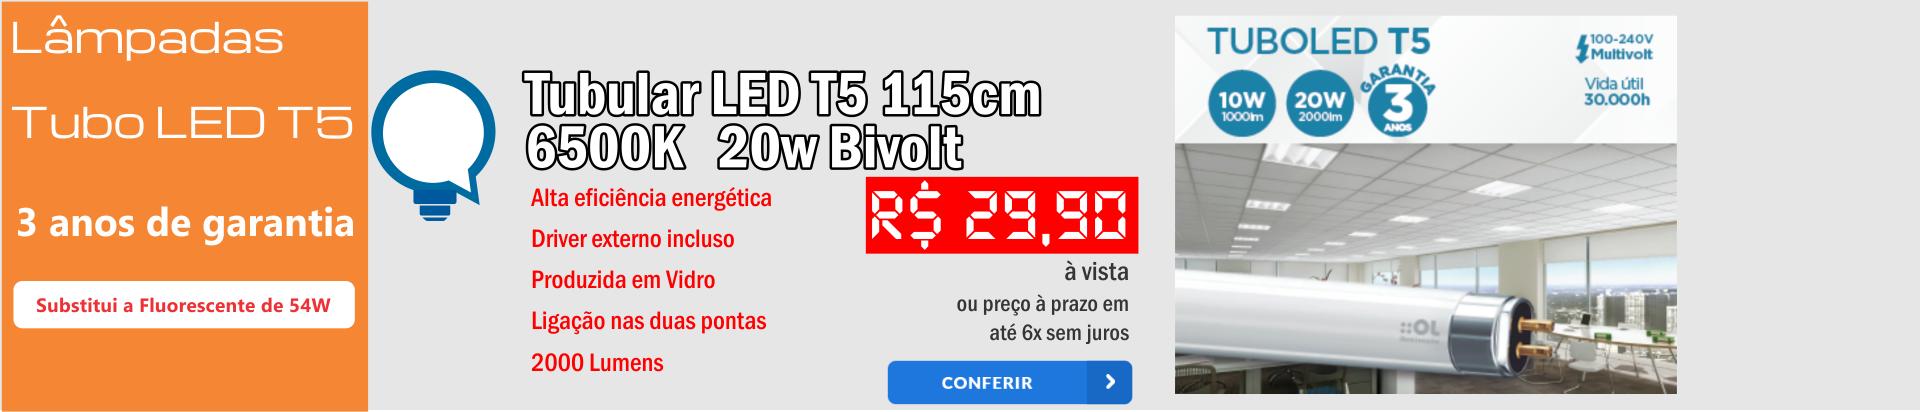 tubular t5 115cm